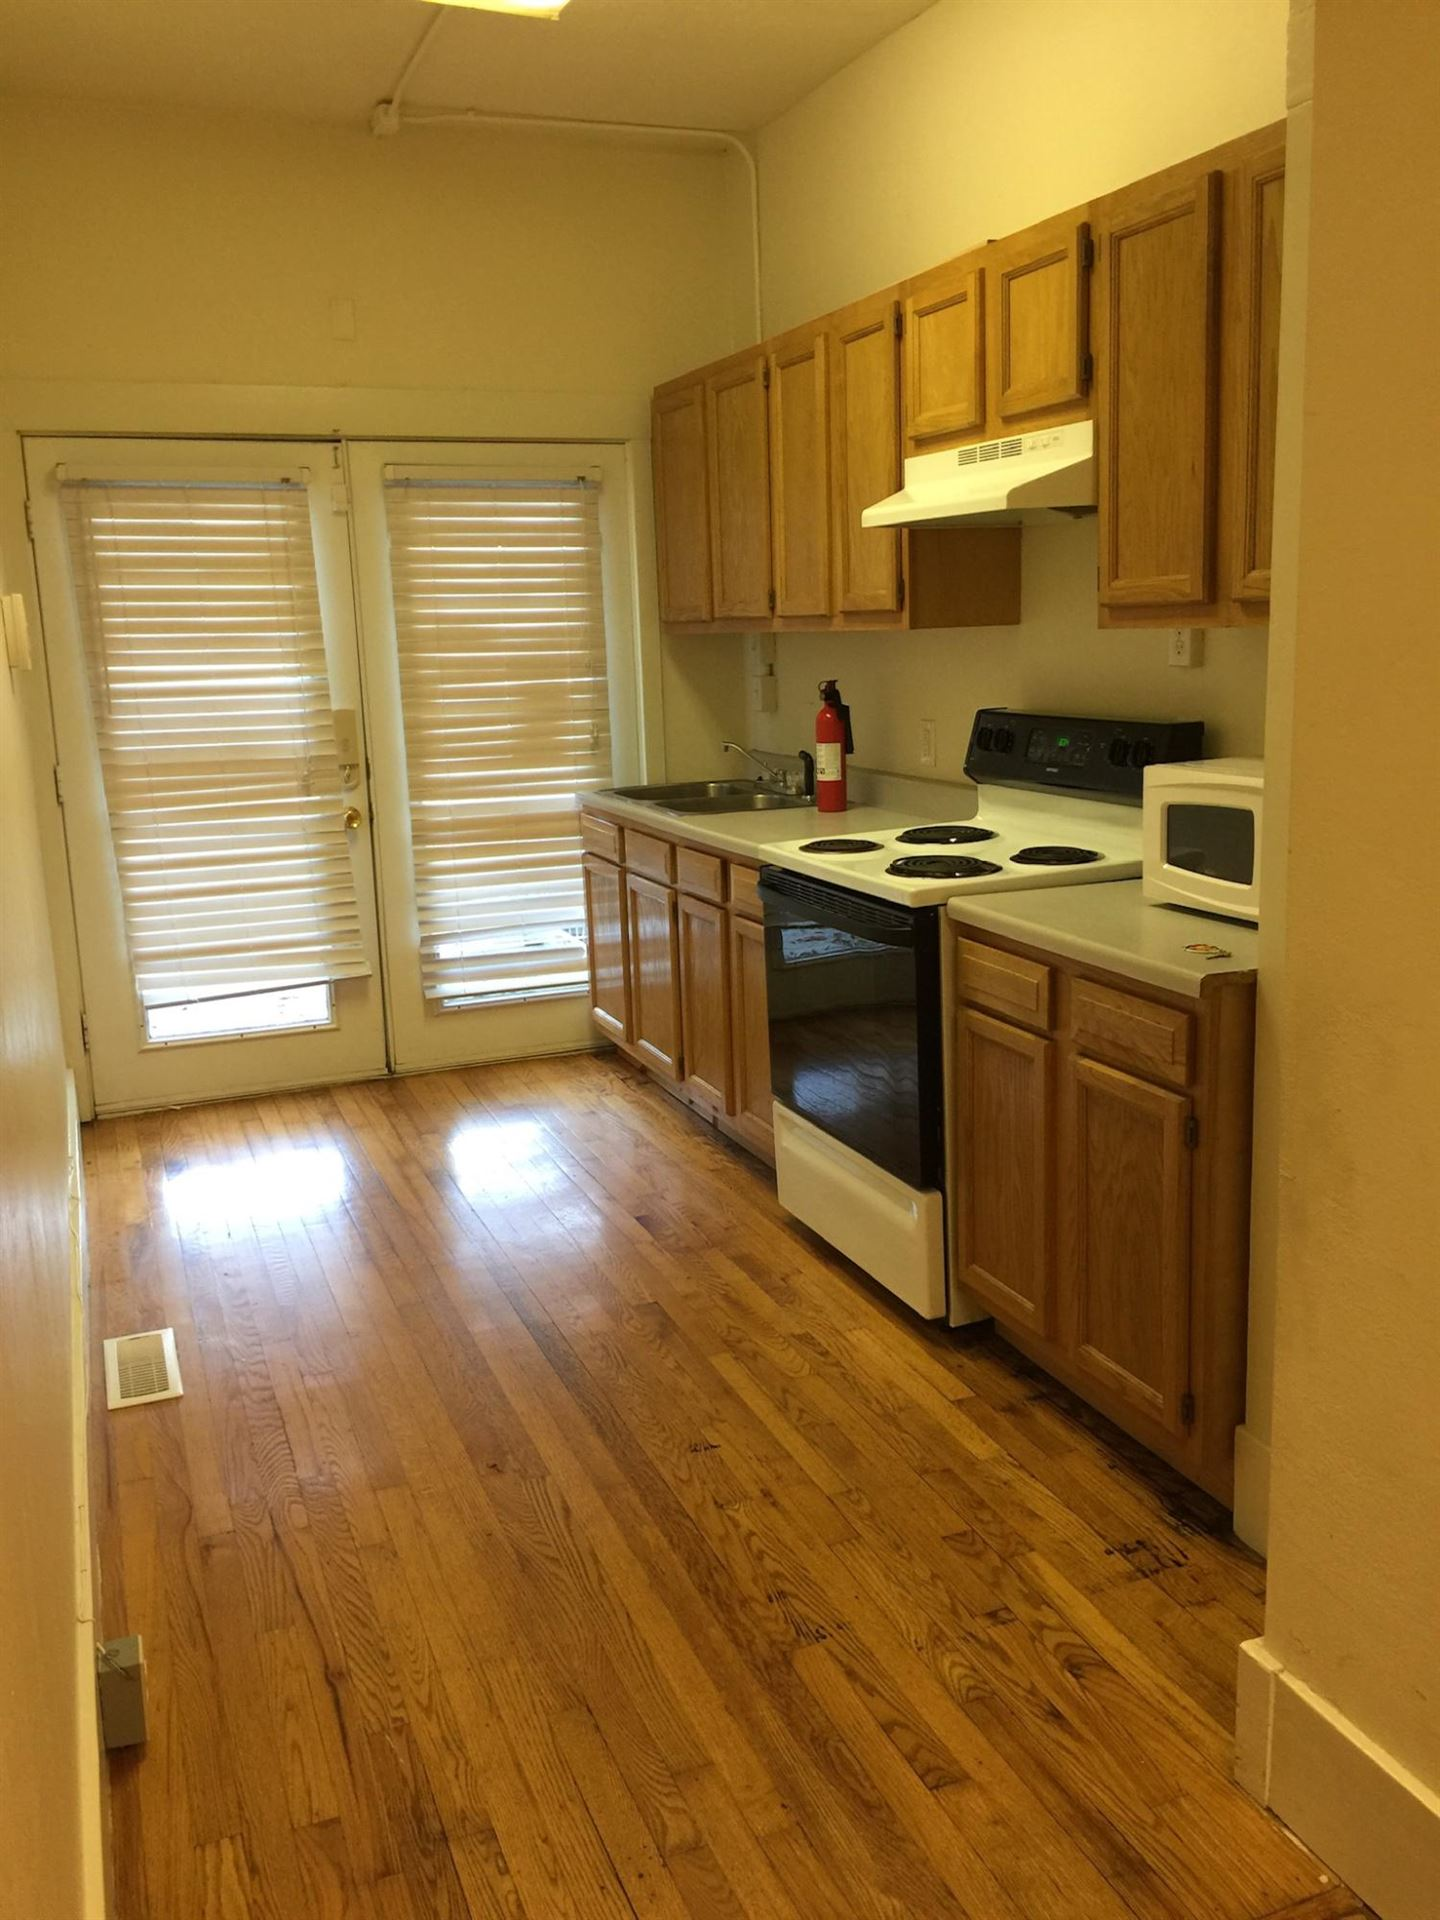 Photo of 1006 NE Thompson Place, Knoxville, TN 37917 (MLS # 1140097)